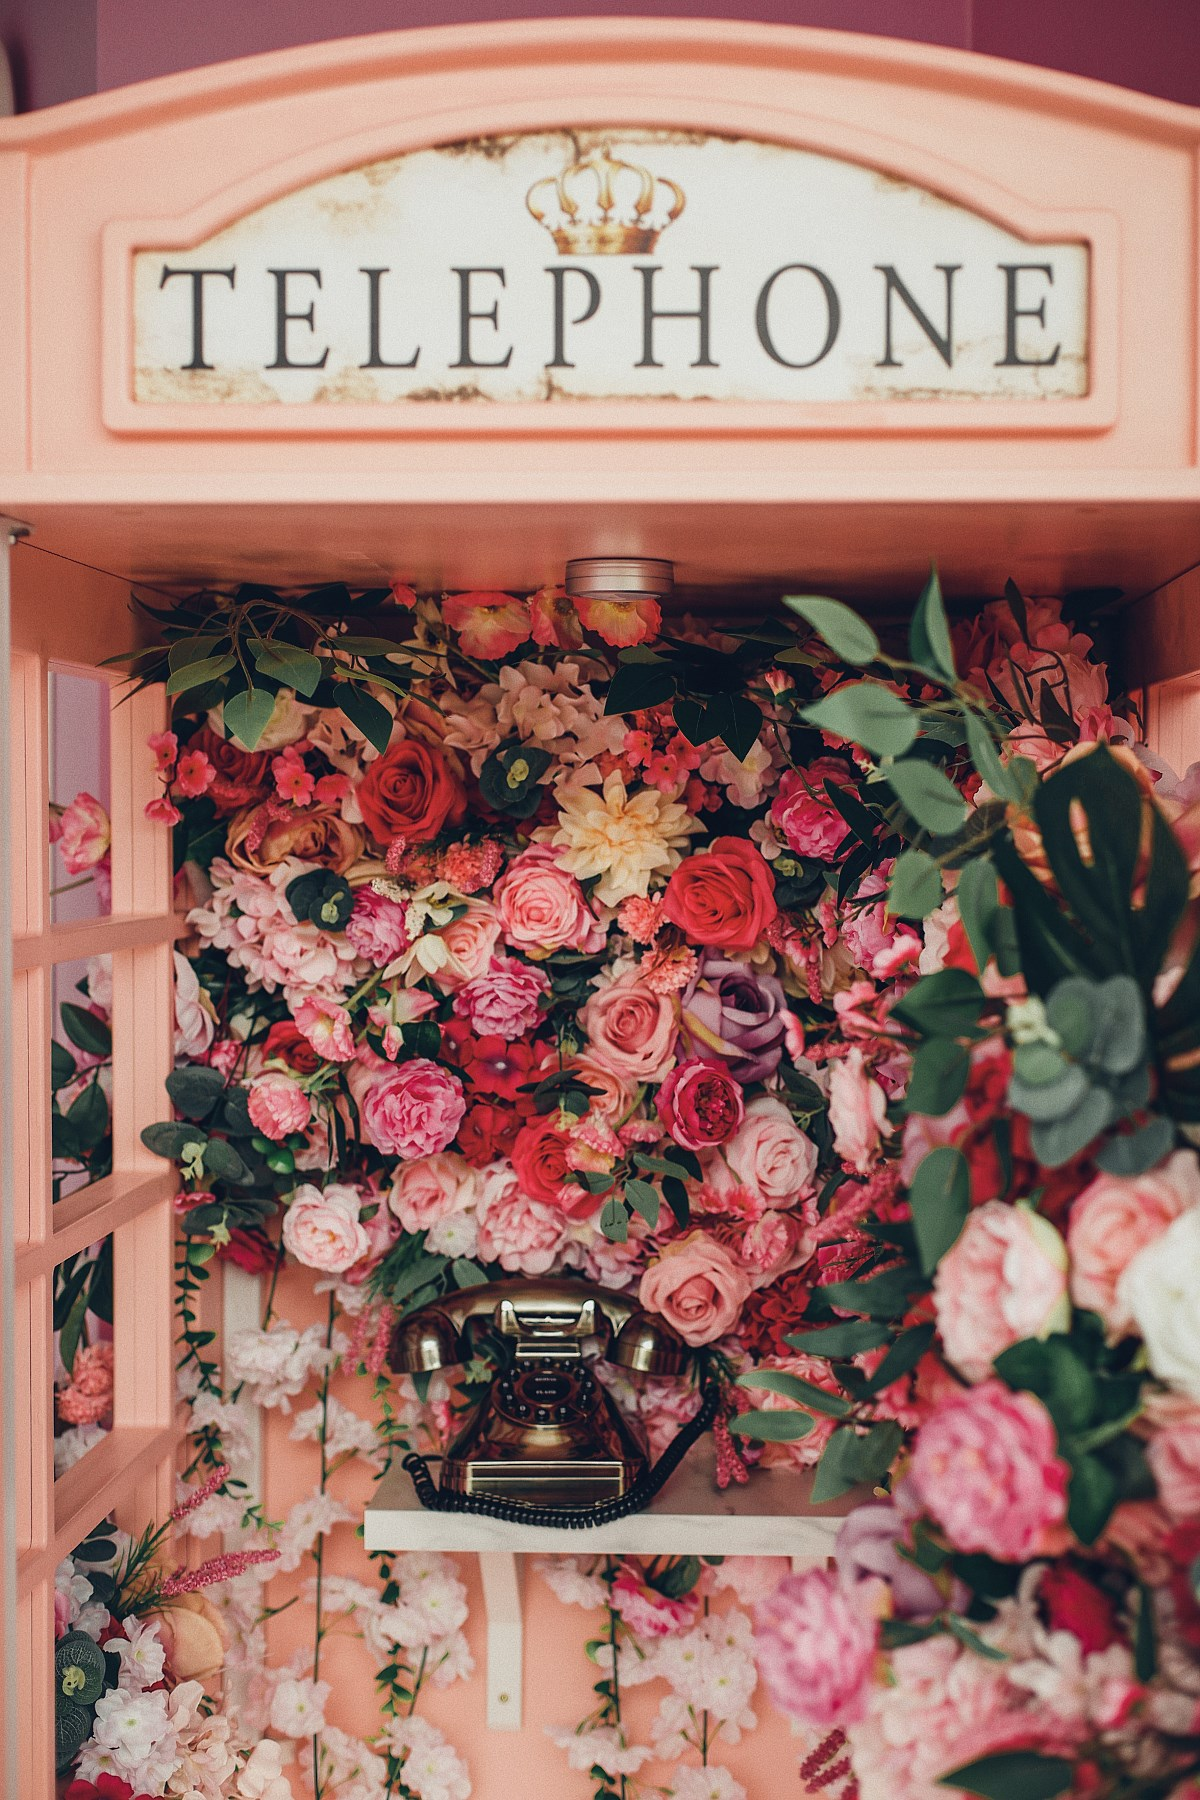 Essens Beauty Bar różowa budka telefoniczna